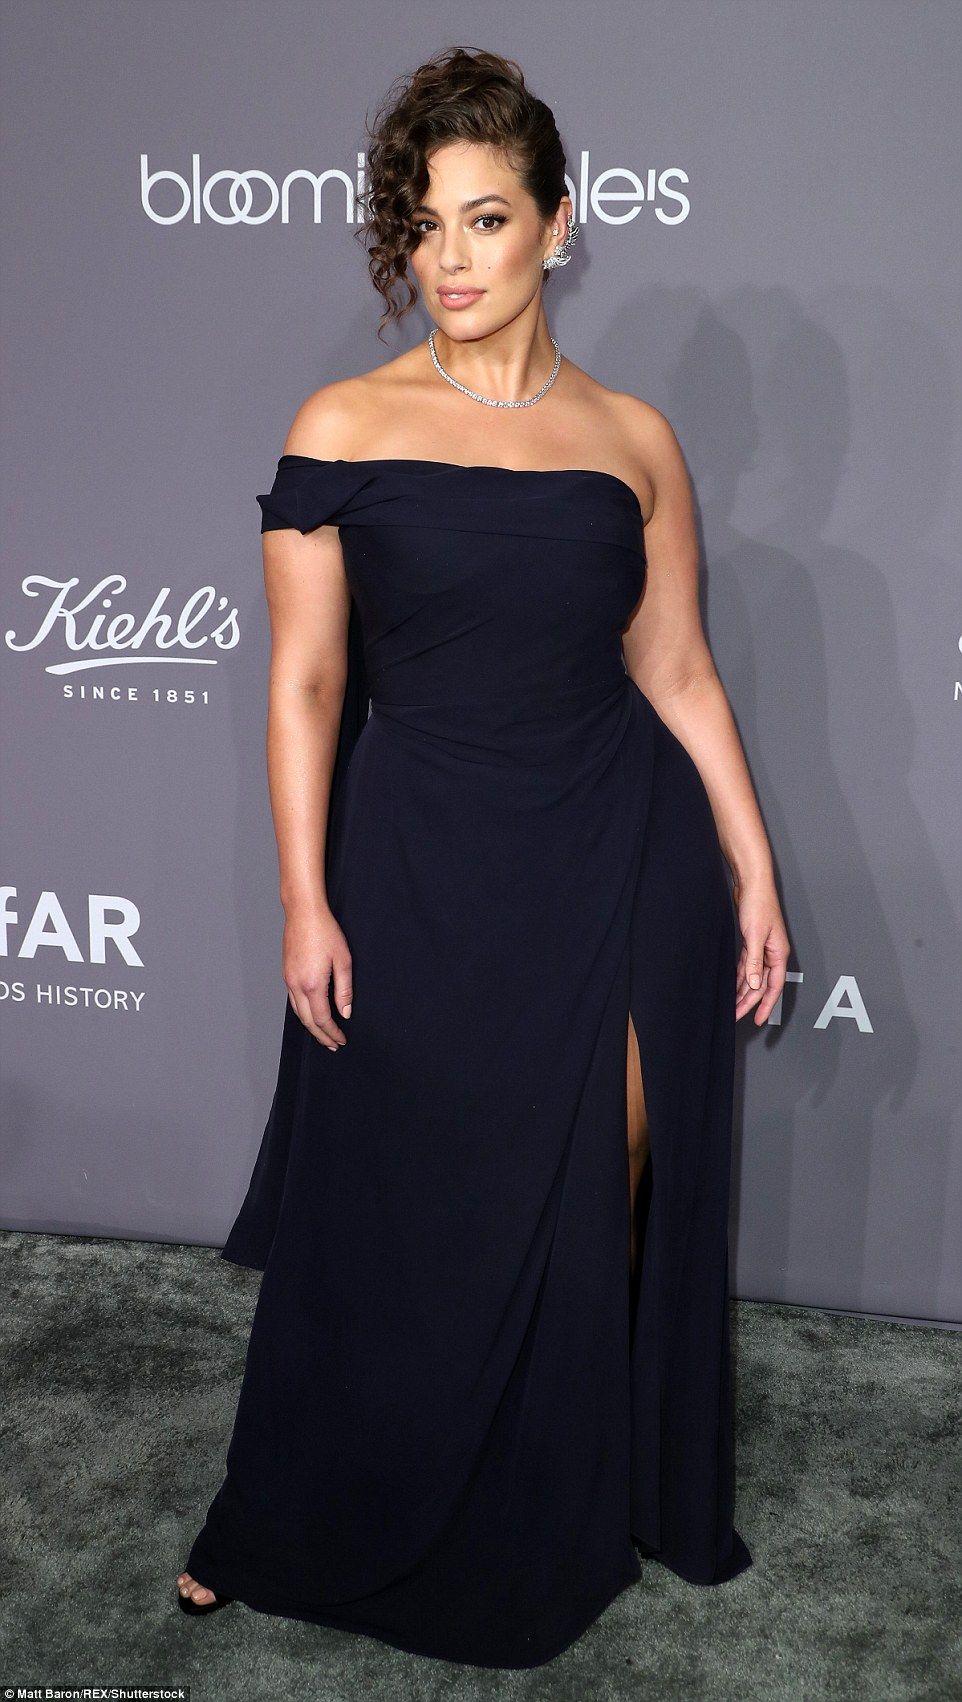 Ashley Graham, Heidi Klum, Olivia Culpo,Halsey at NYC amfAR gala ...